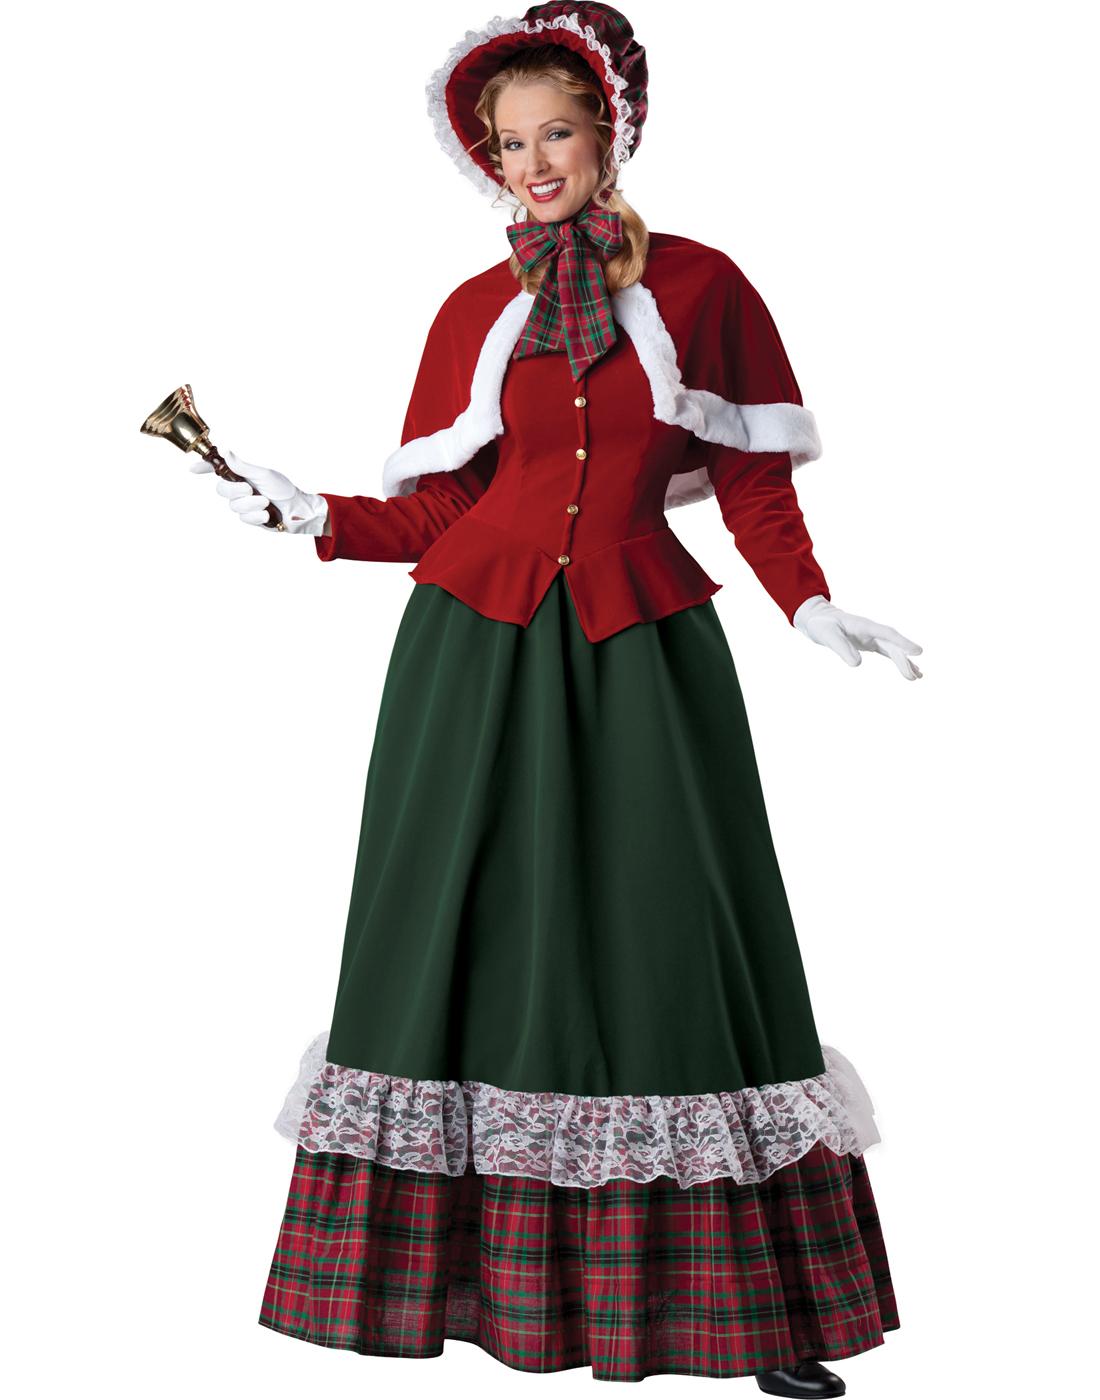 Yuletide Lady Victorian Carol Singer Womens Christmas Costume Ebay